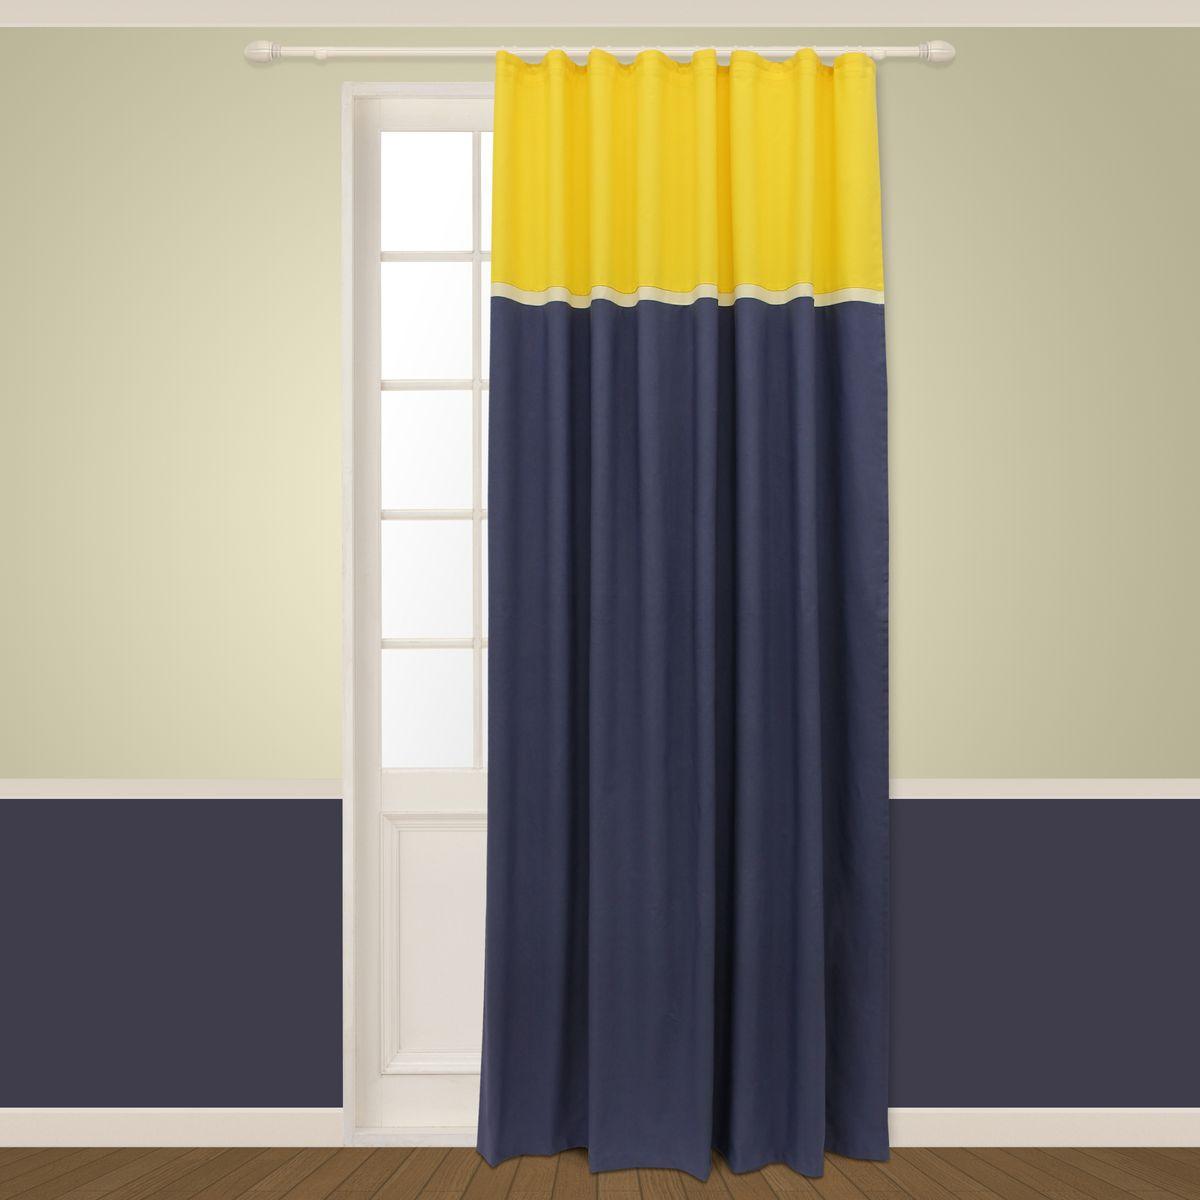 Штора Sanpa Home Collection Меланта, на ленте, цвет: желтый, синий, высота 260 смHP5450v20256/20466 Меланта желто-синий, , 180*260 см